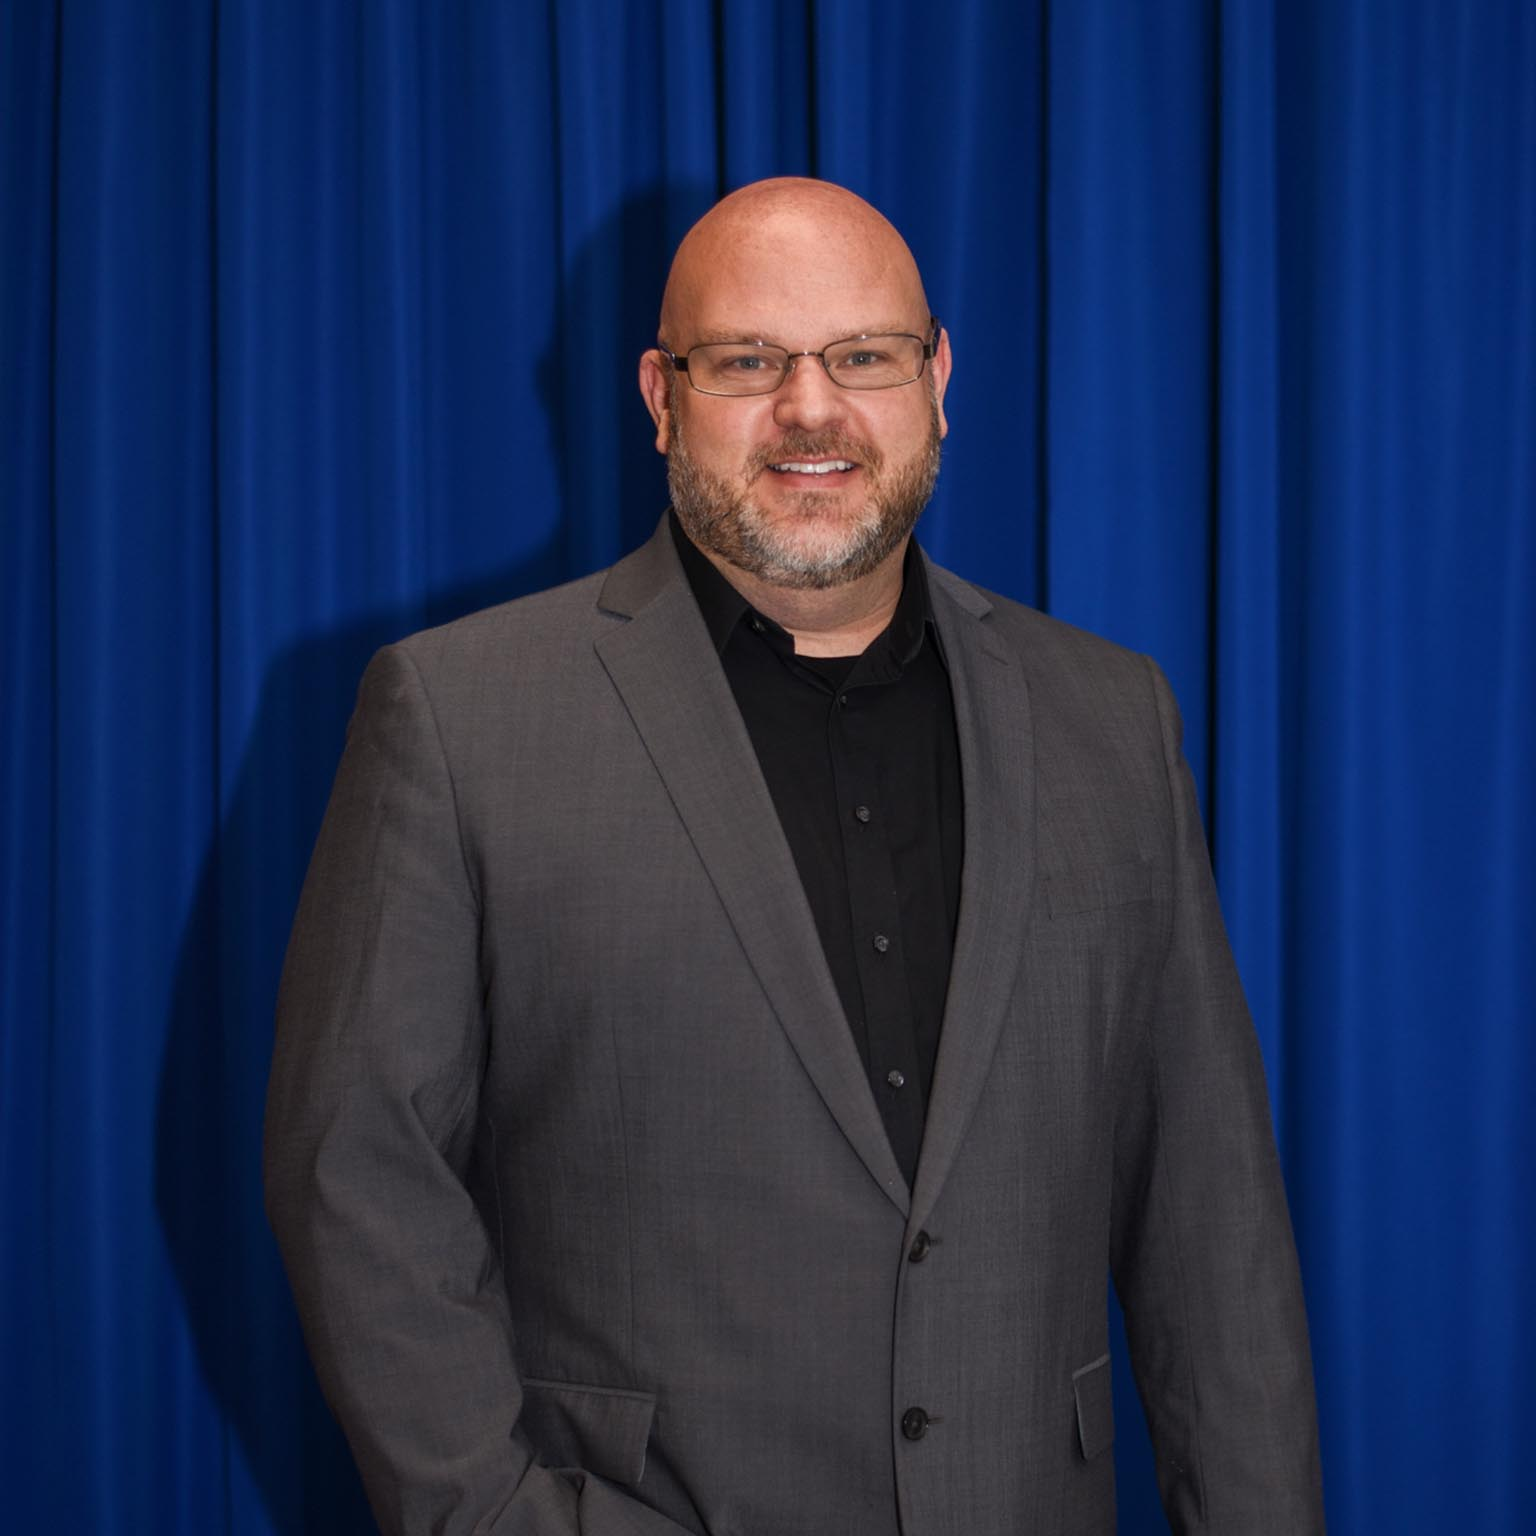 Ryan Rainbolt - President of Garner Holt Education Through Imagination